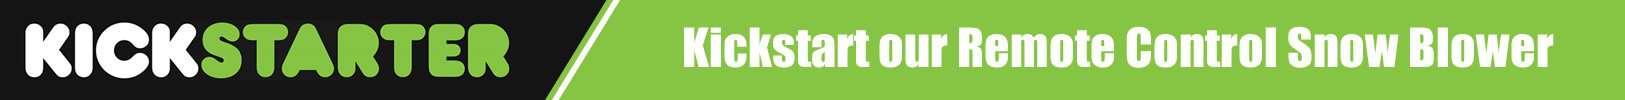 SuperDroid Robots and KickStarter